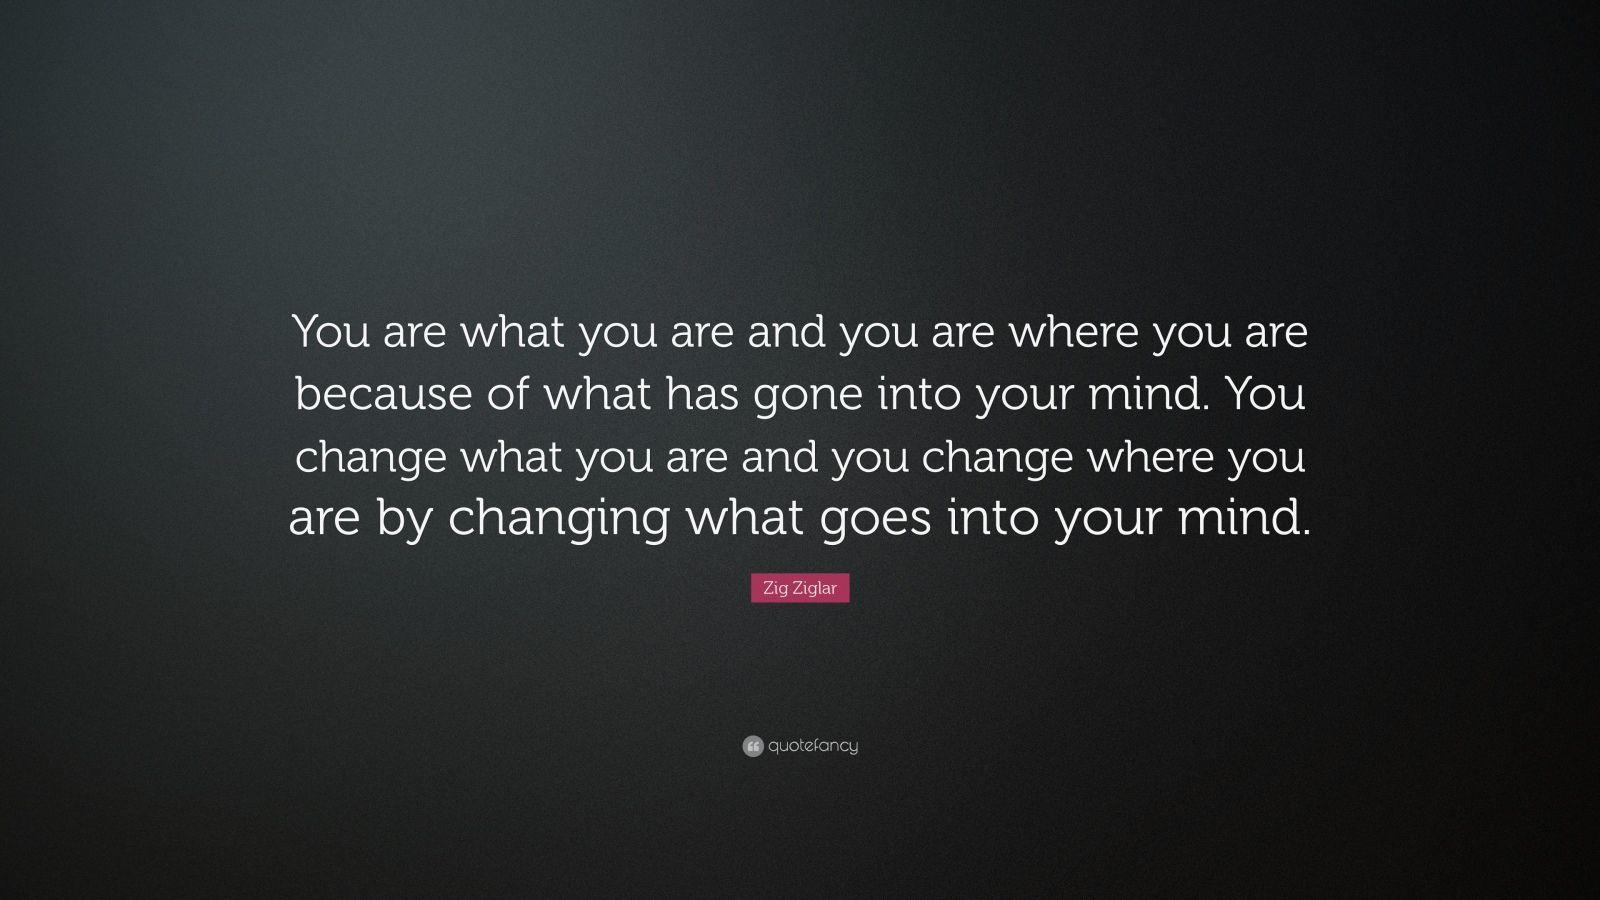 Zig Ziglar Quotes On Change